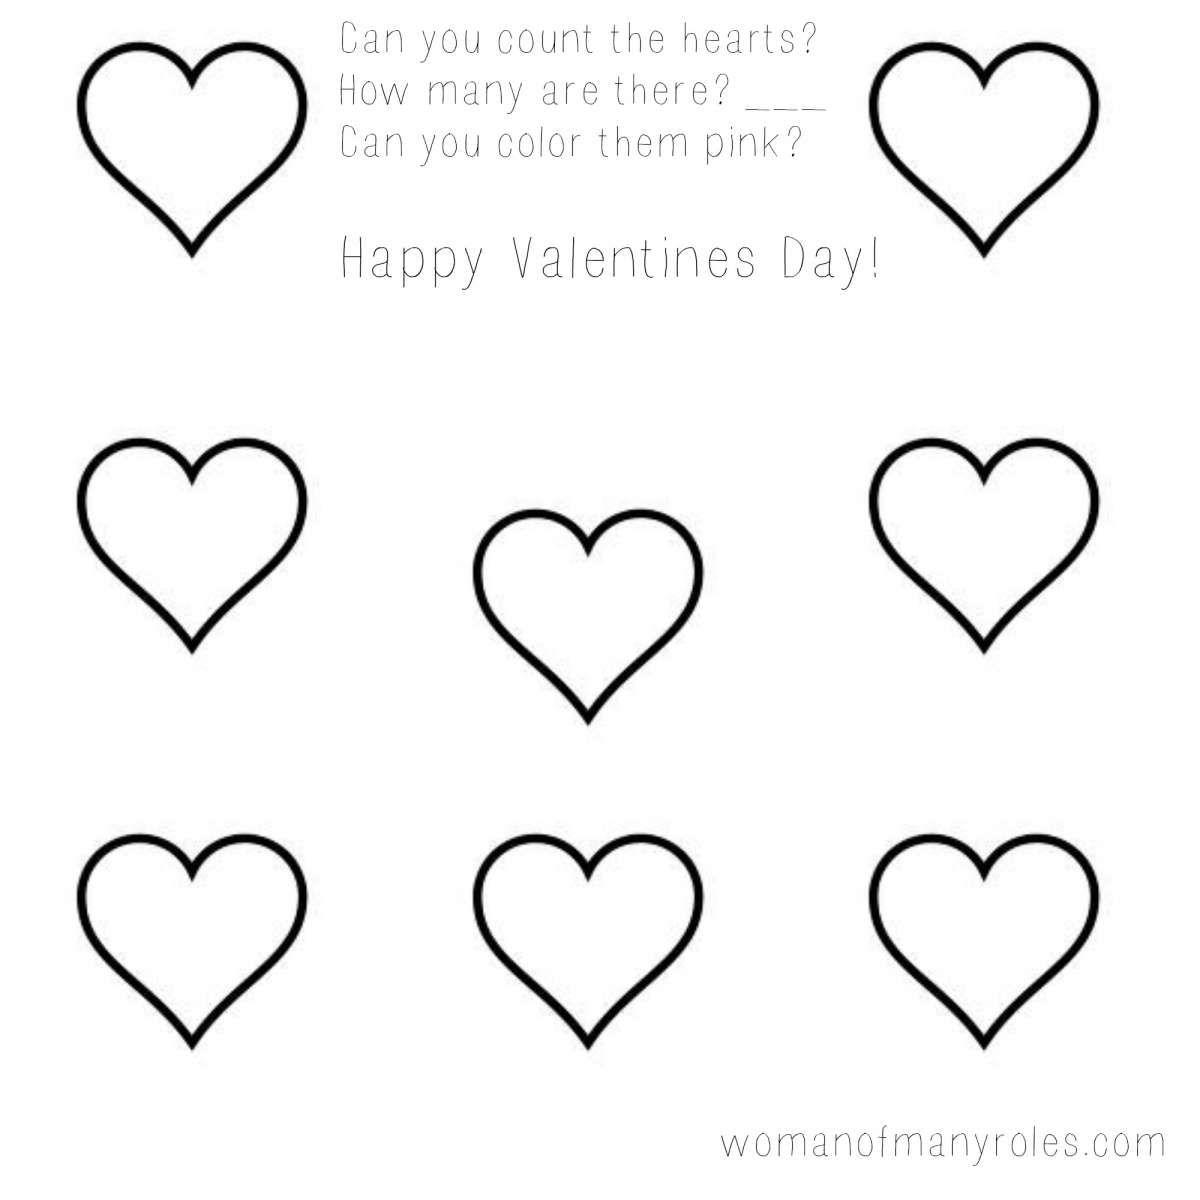 7 Heart Preschool Worksheet